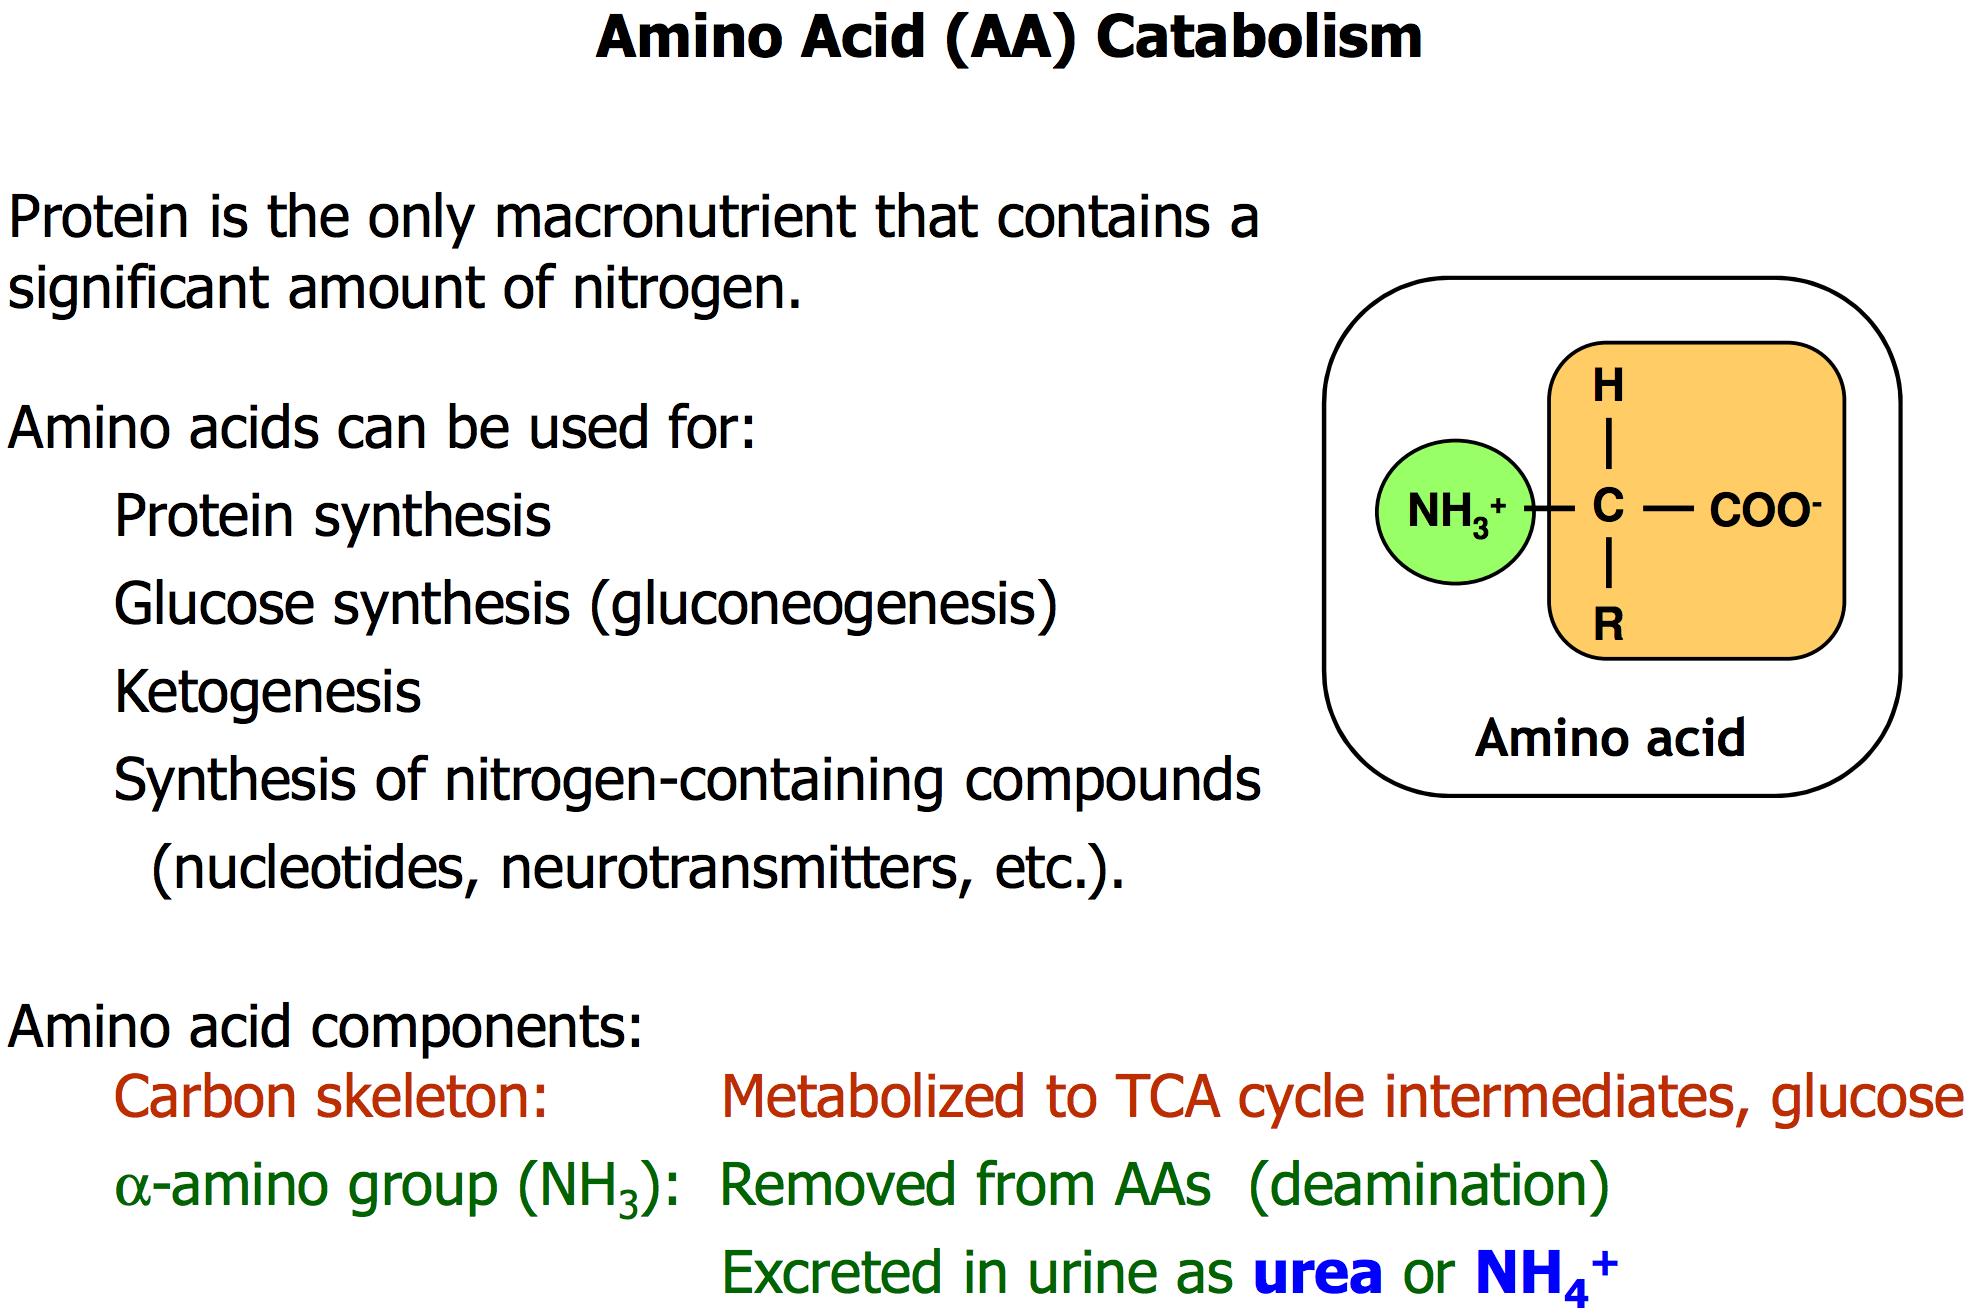 GS L43/44 Amino Acid Catabolism I & II (GS BIOCHEM E4 ...